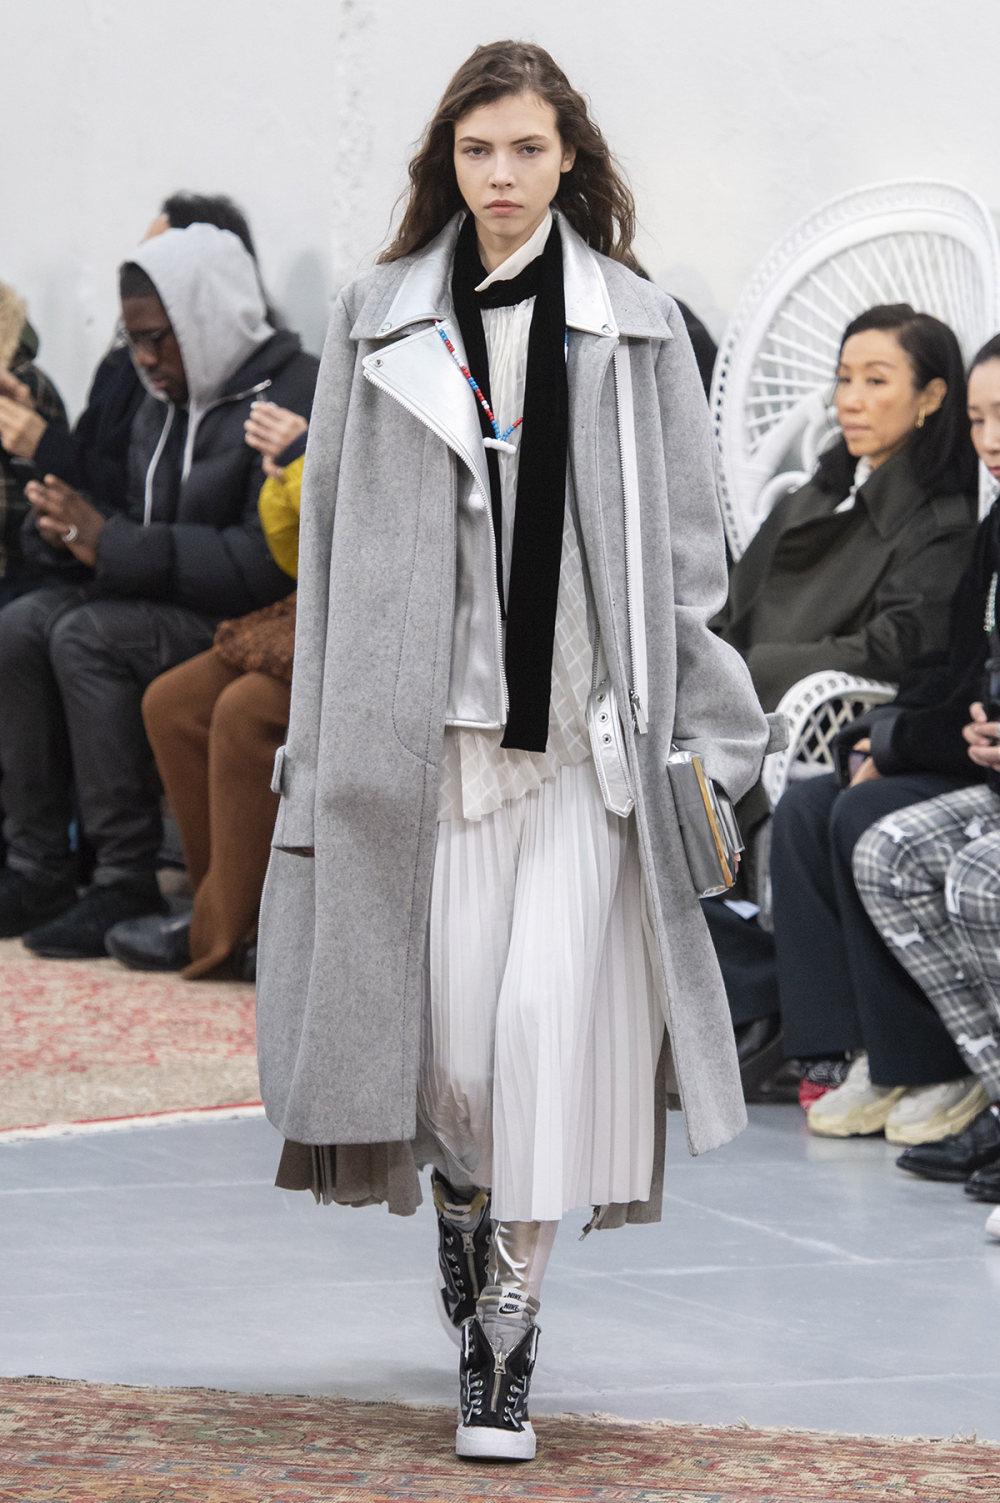 Sacai时装系列超大号黑色圆领毛衣和长款绿色北欧毛衣连衣裙-7.jpg